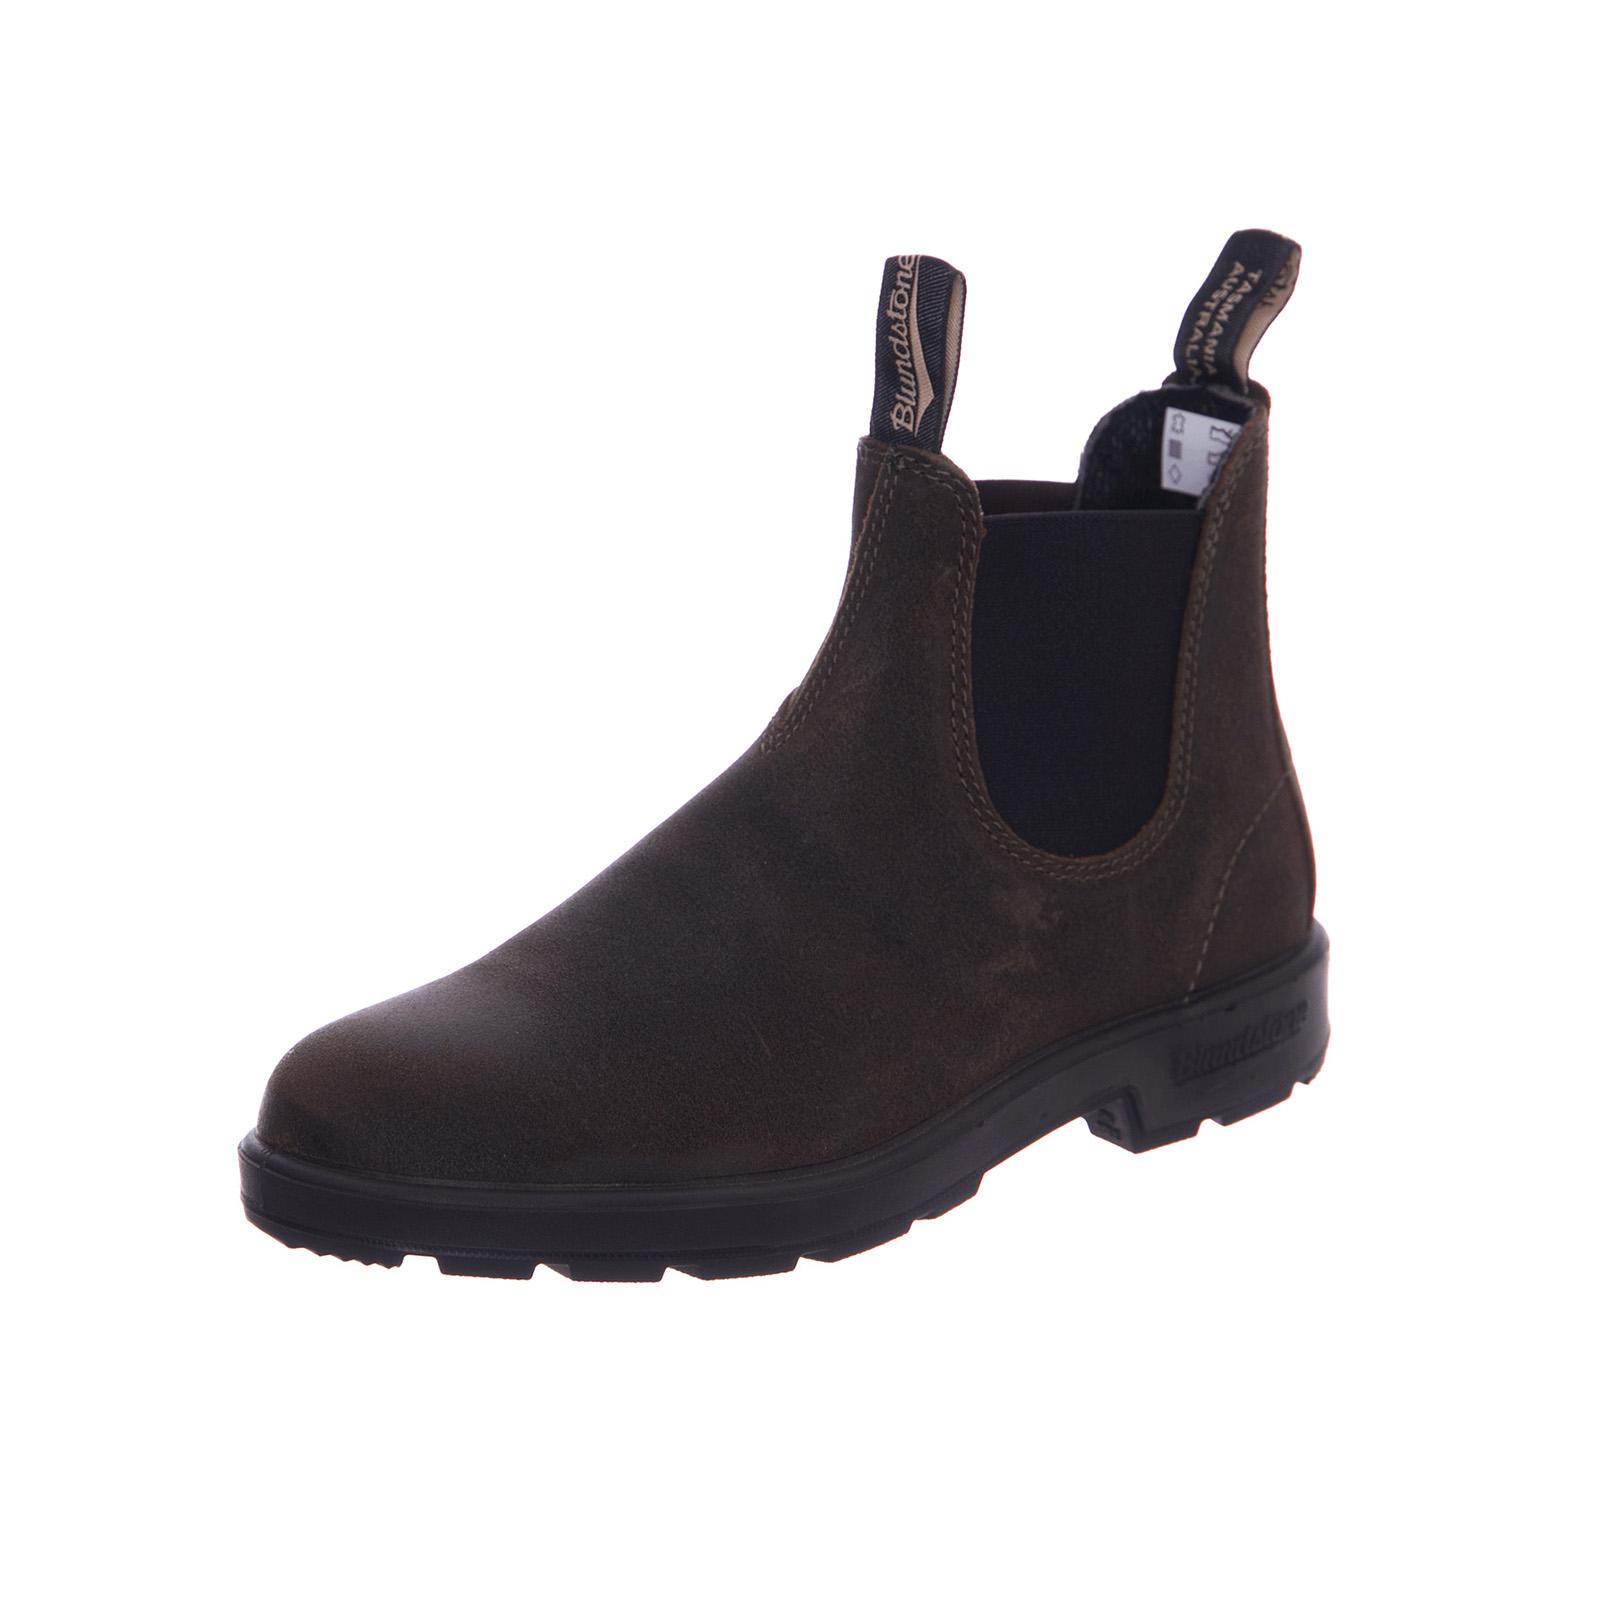 2b47277cdda4c Blundstone Stivali 1615 Elside Boot Old Suede Dark Green Verde